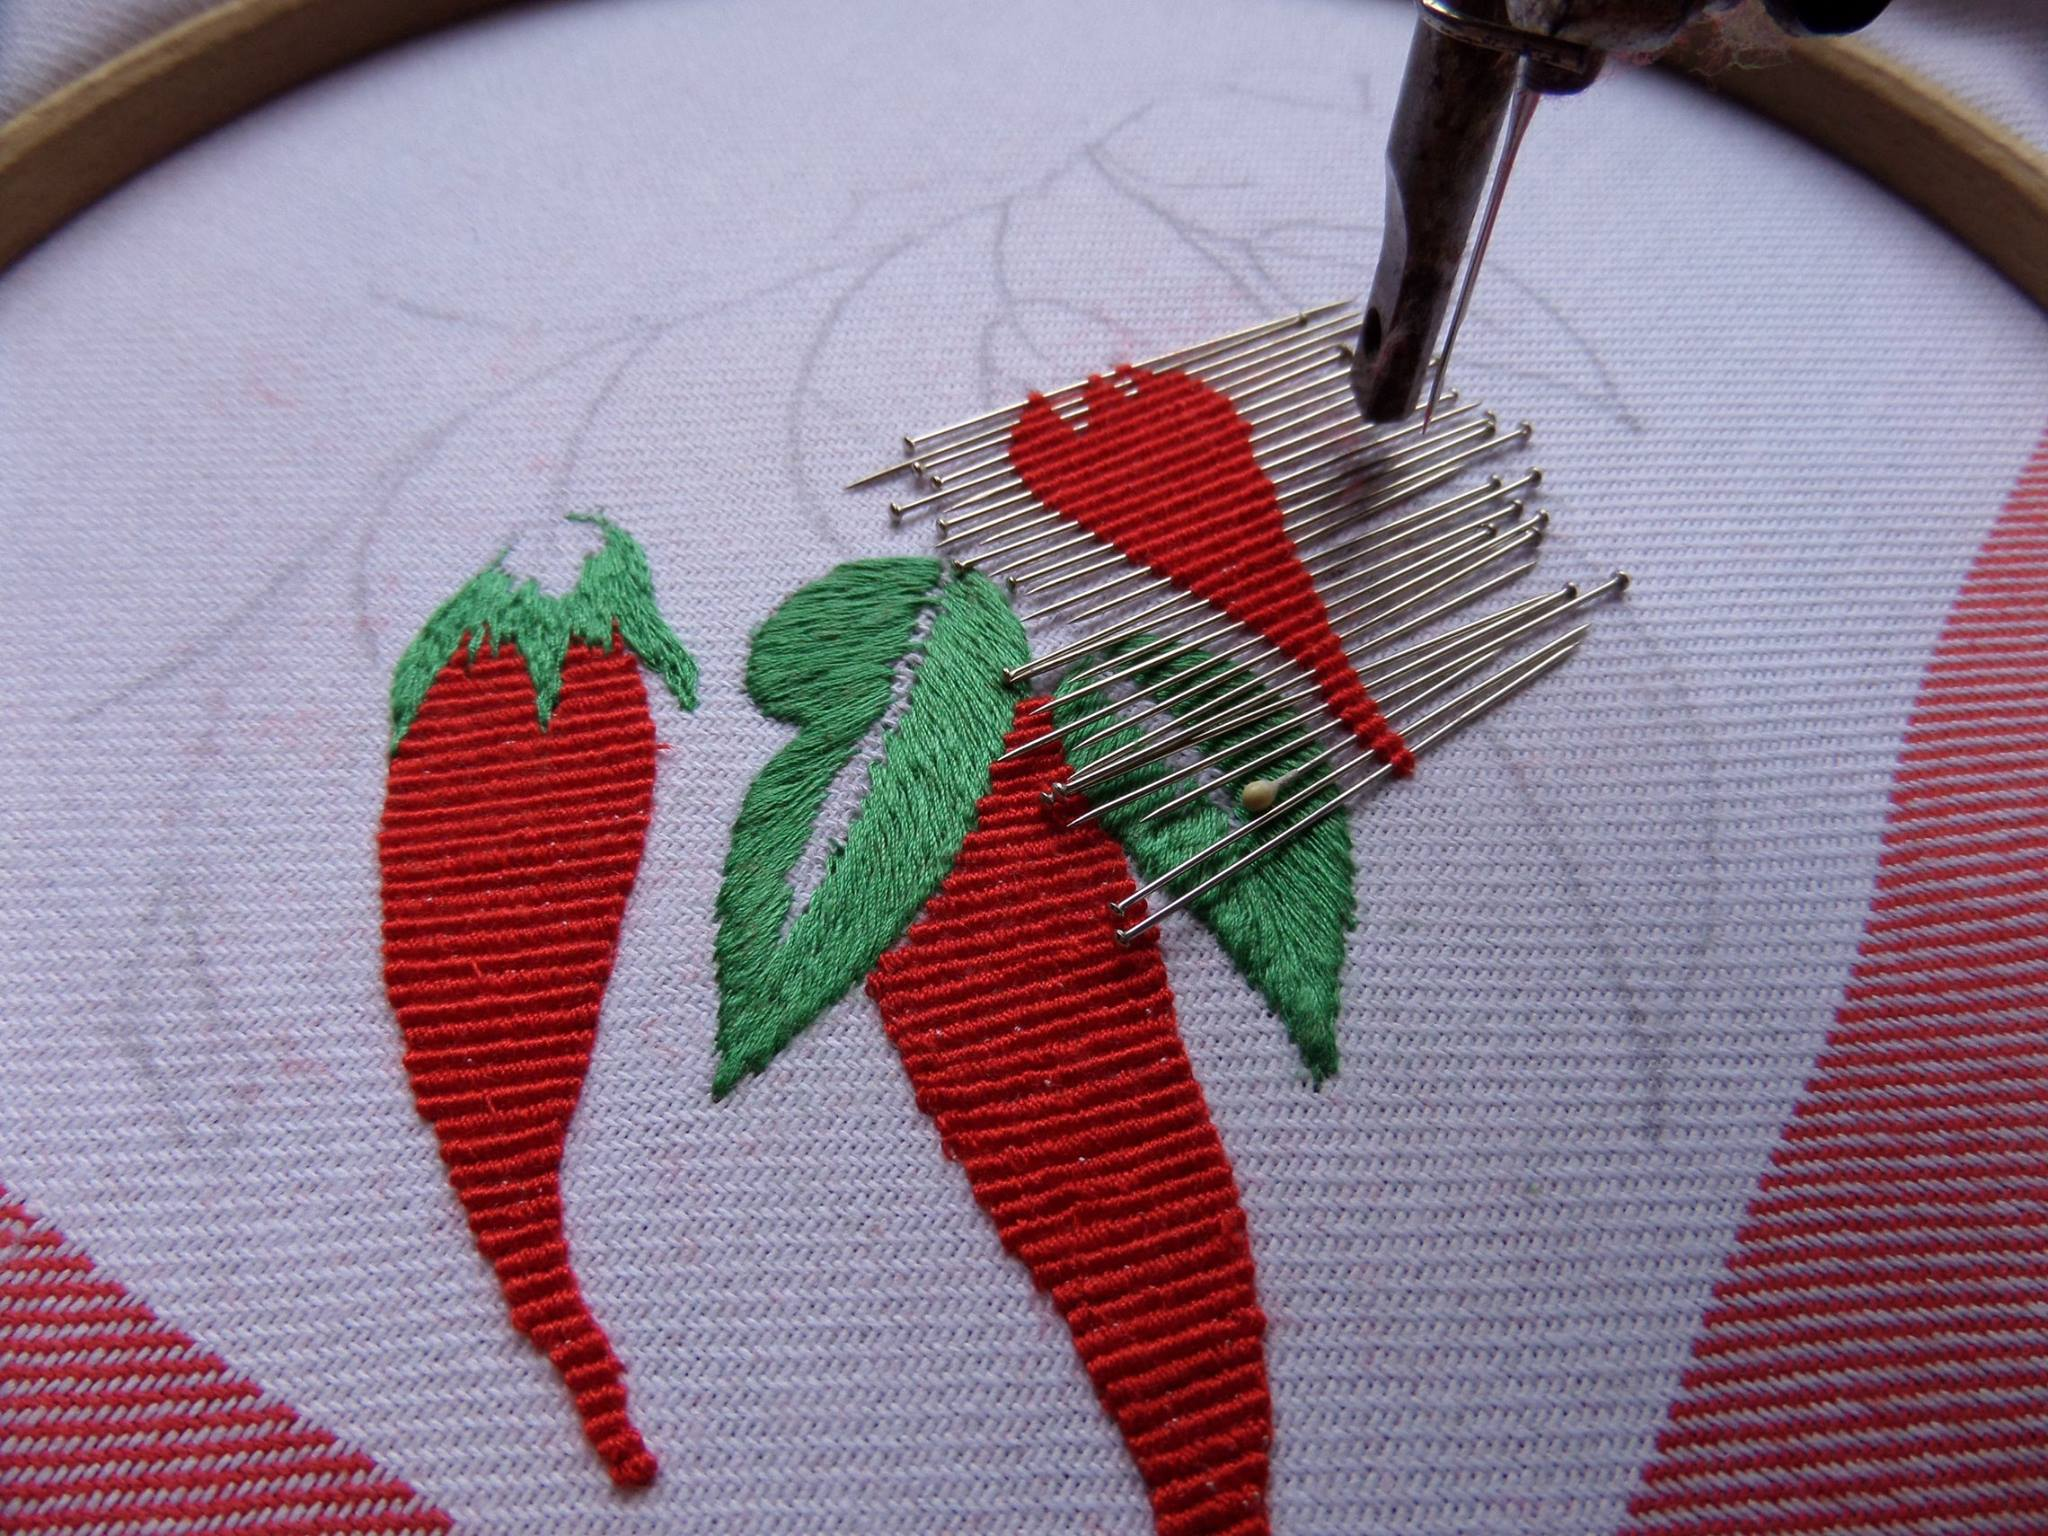 Вышивка в свободно -ходовой технике, new:вышивка на трикотаже, как? Форум 37